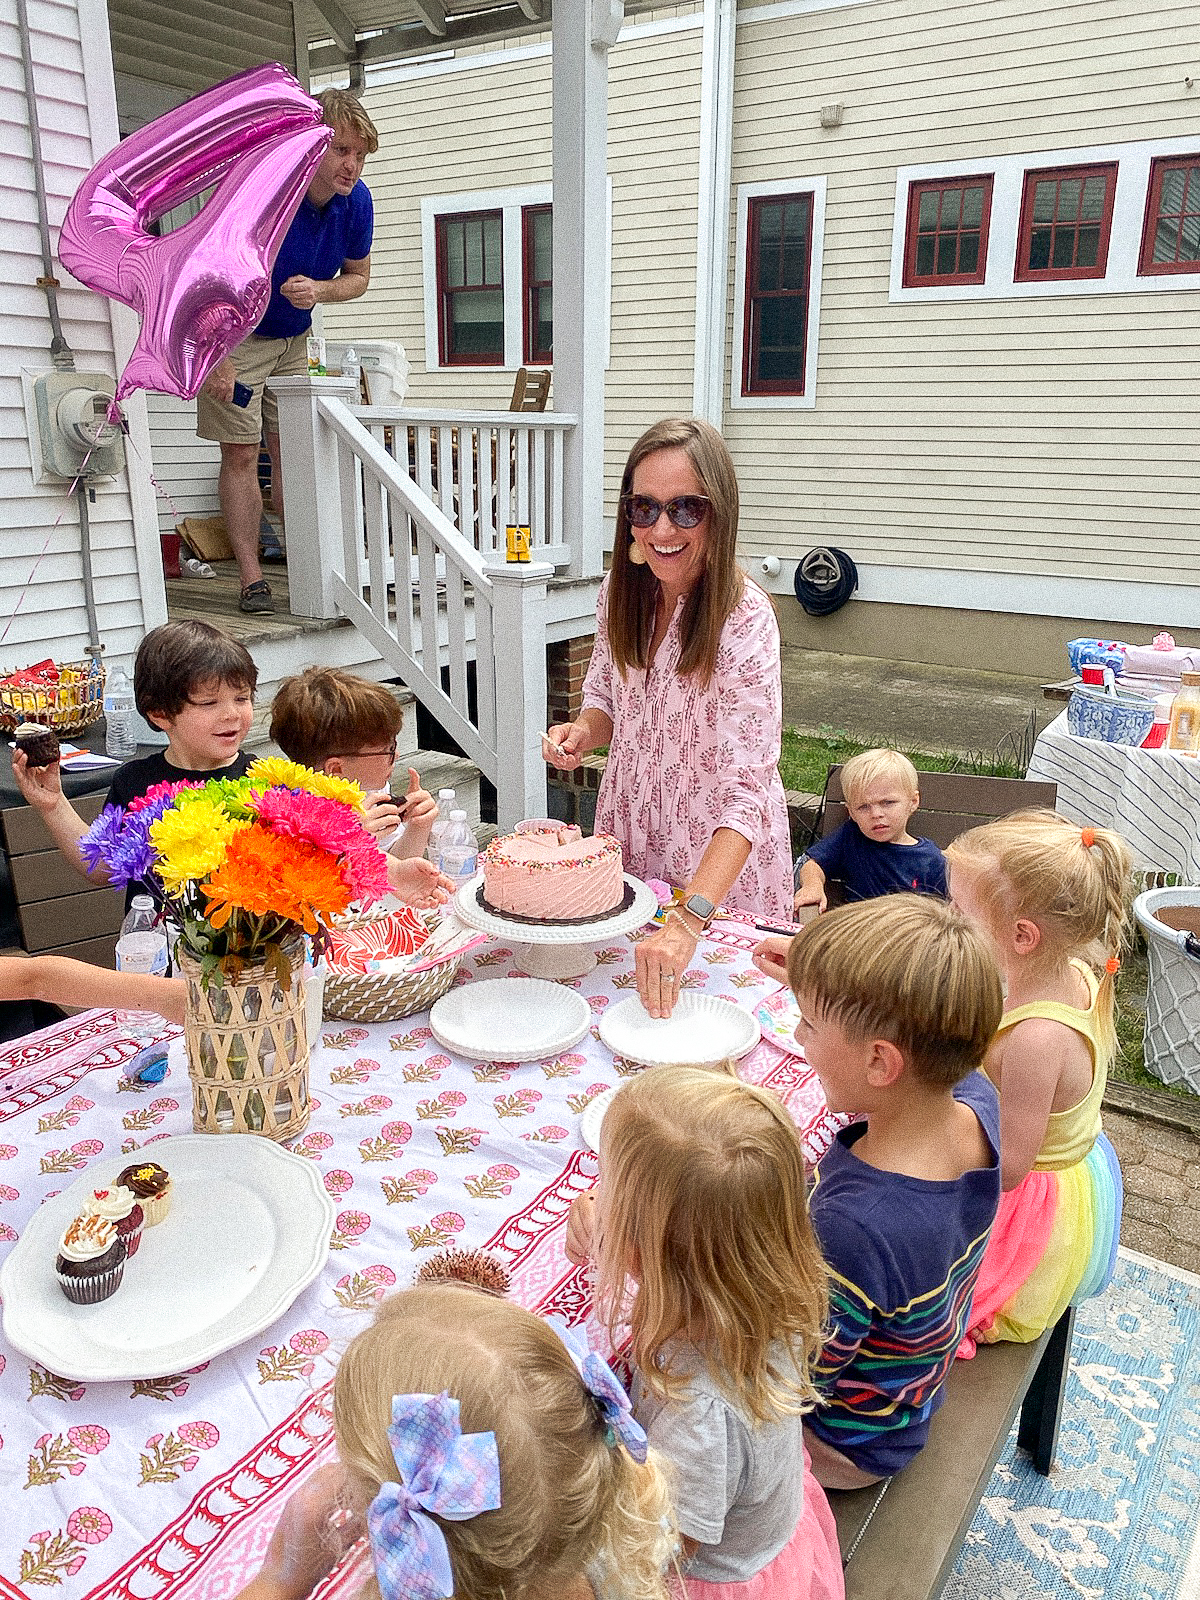 madison mathews juliette dress - kids birthday party - block print table cloth - block print dress - 4th birthday party